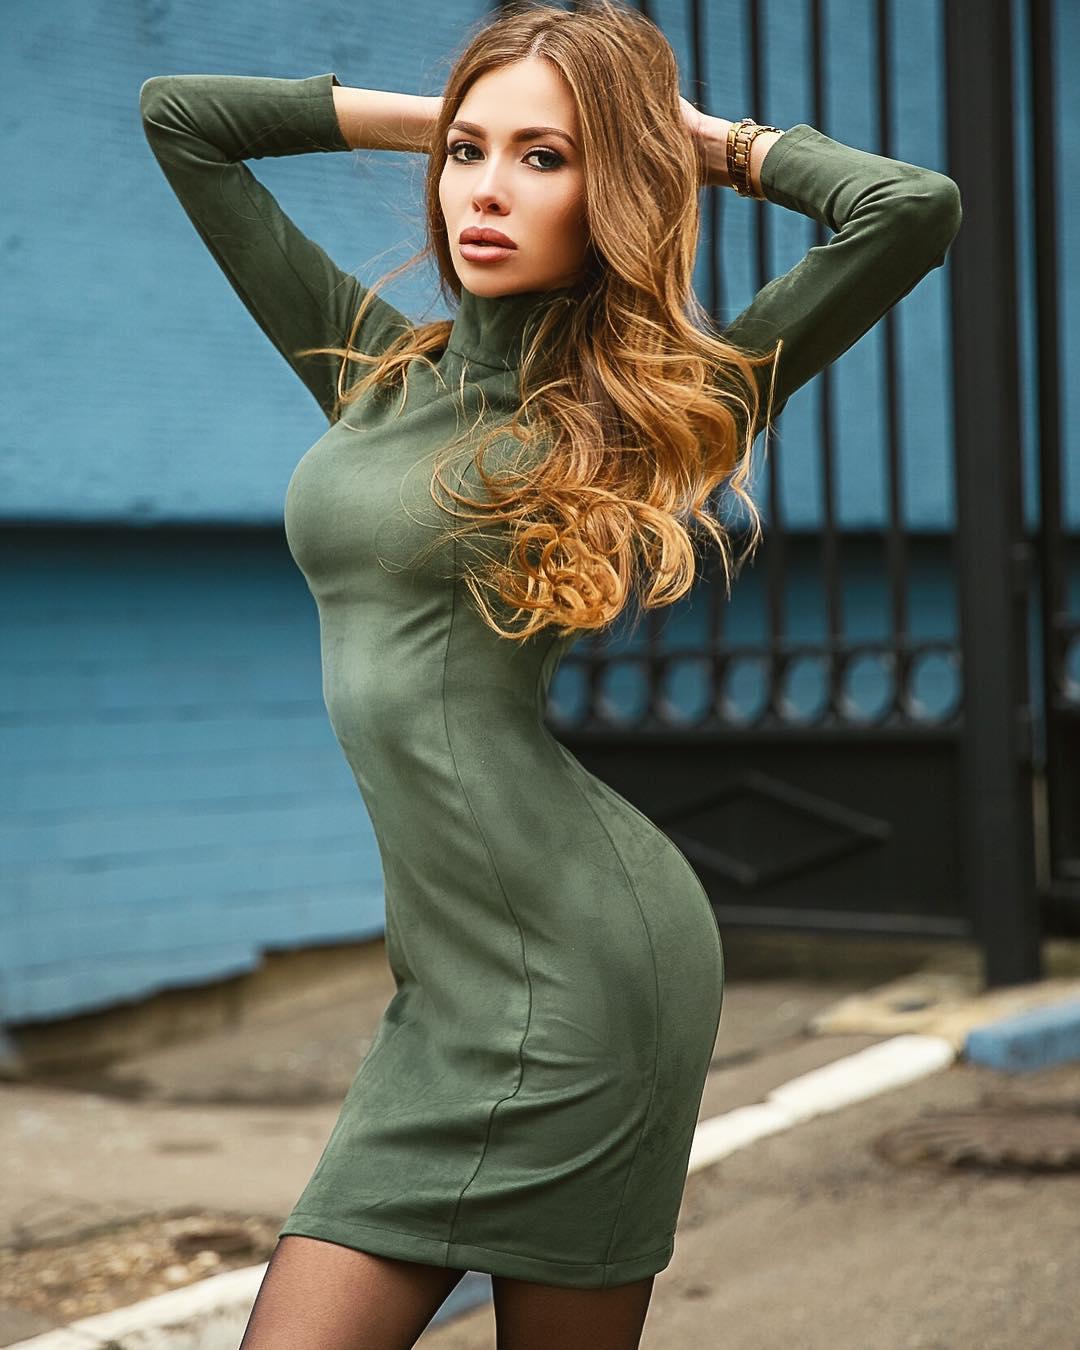 NAZAROVA ARINA - 400 Most Beauty Girls On Instagram